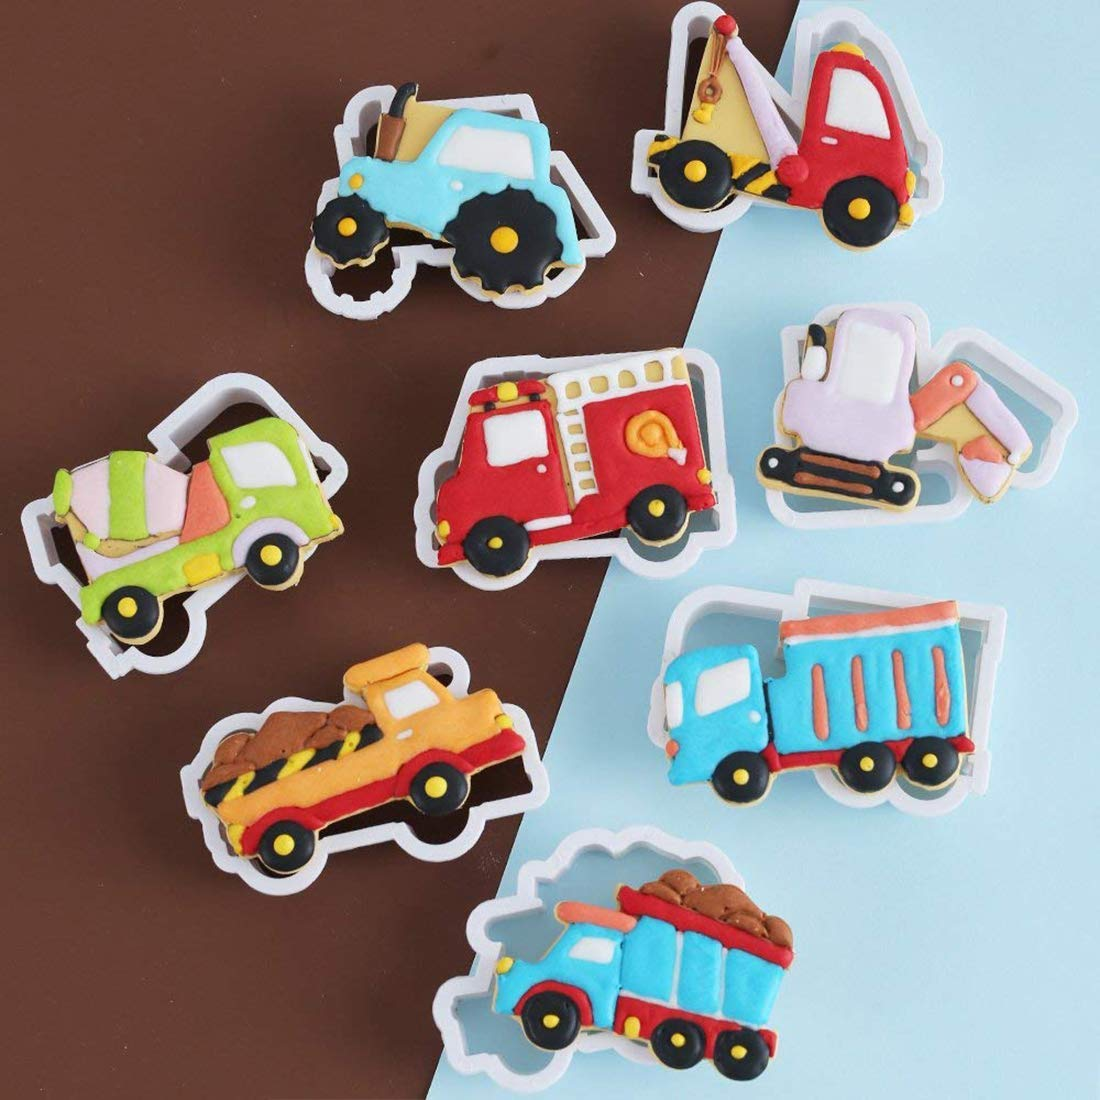 Molde para galletas de coche cortador de galletas moldes para tartas dulces galletas paquete de 8 galletas dise/ño de dibujos animados para reposter/ía DIY